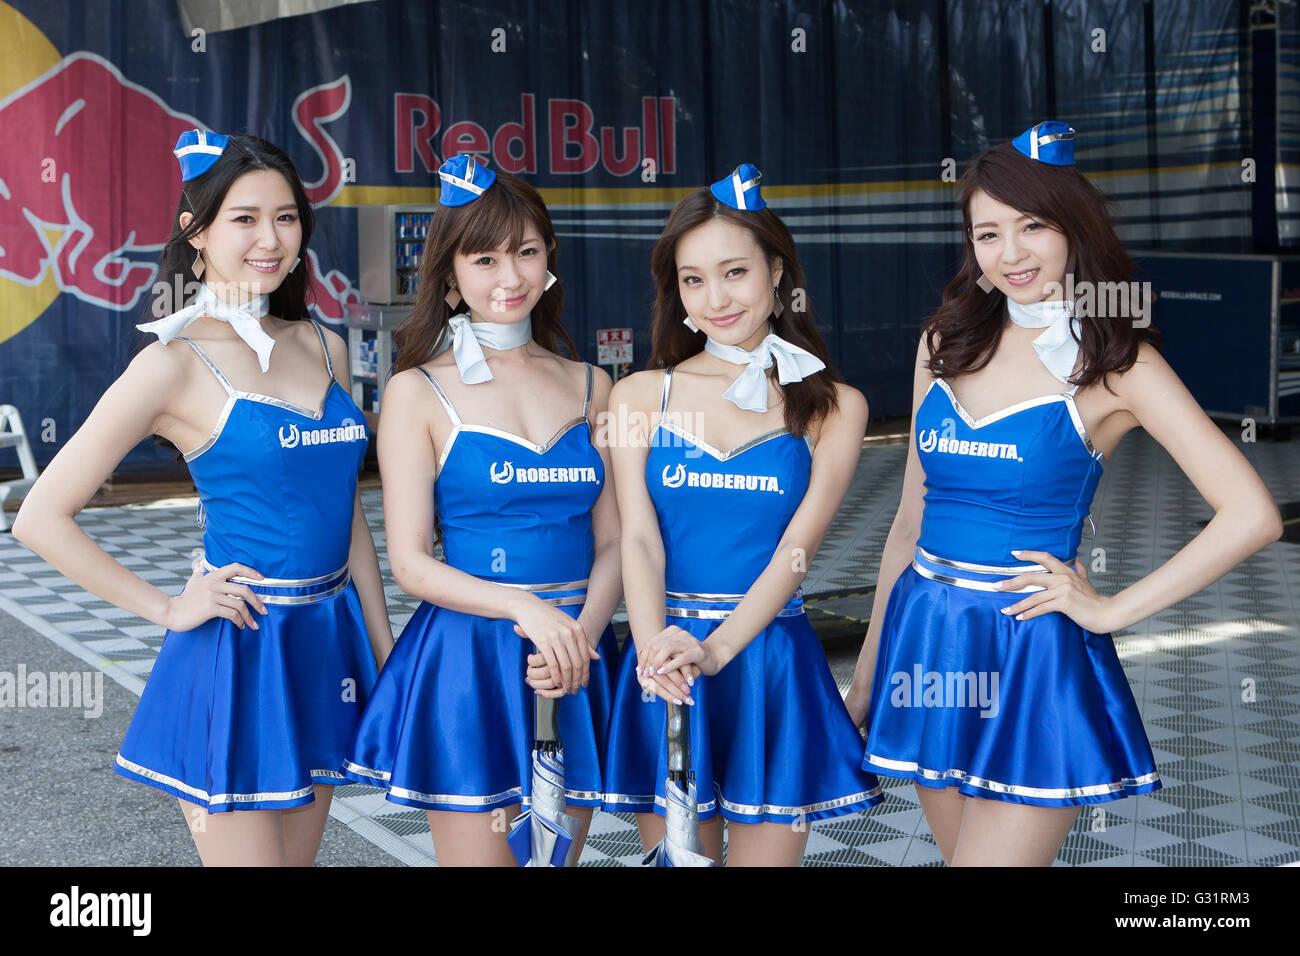 Japanese race queen benetton - 4 8